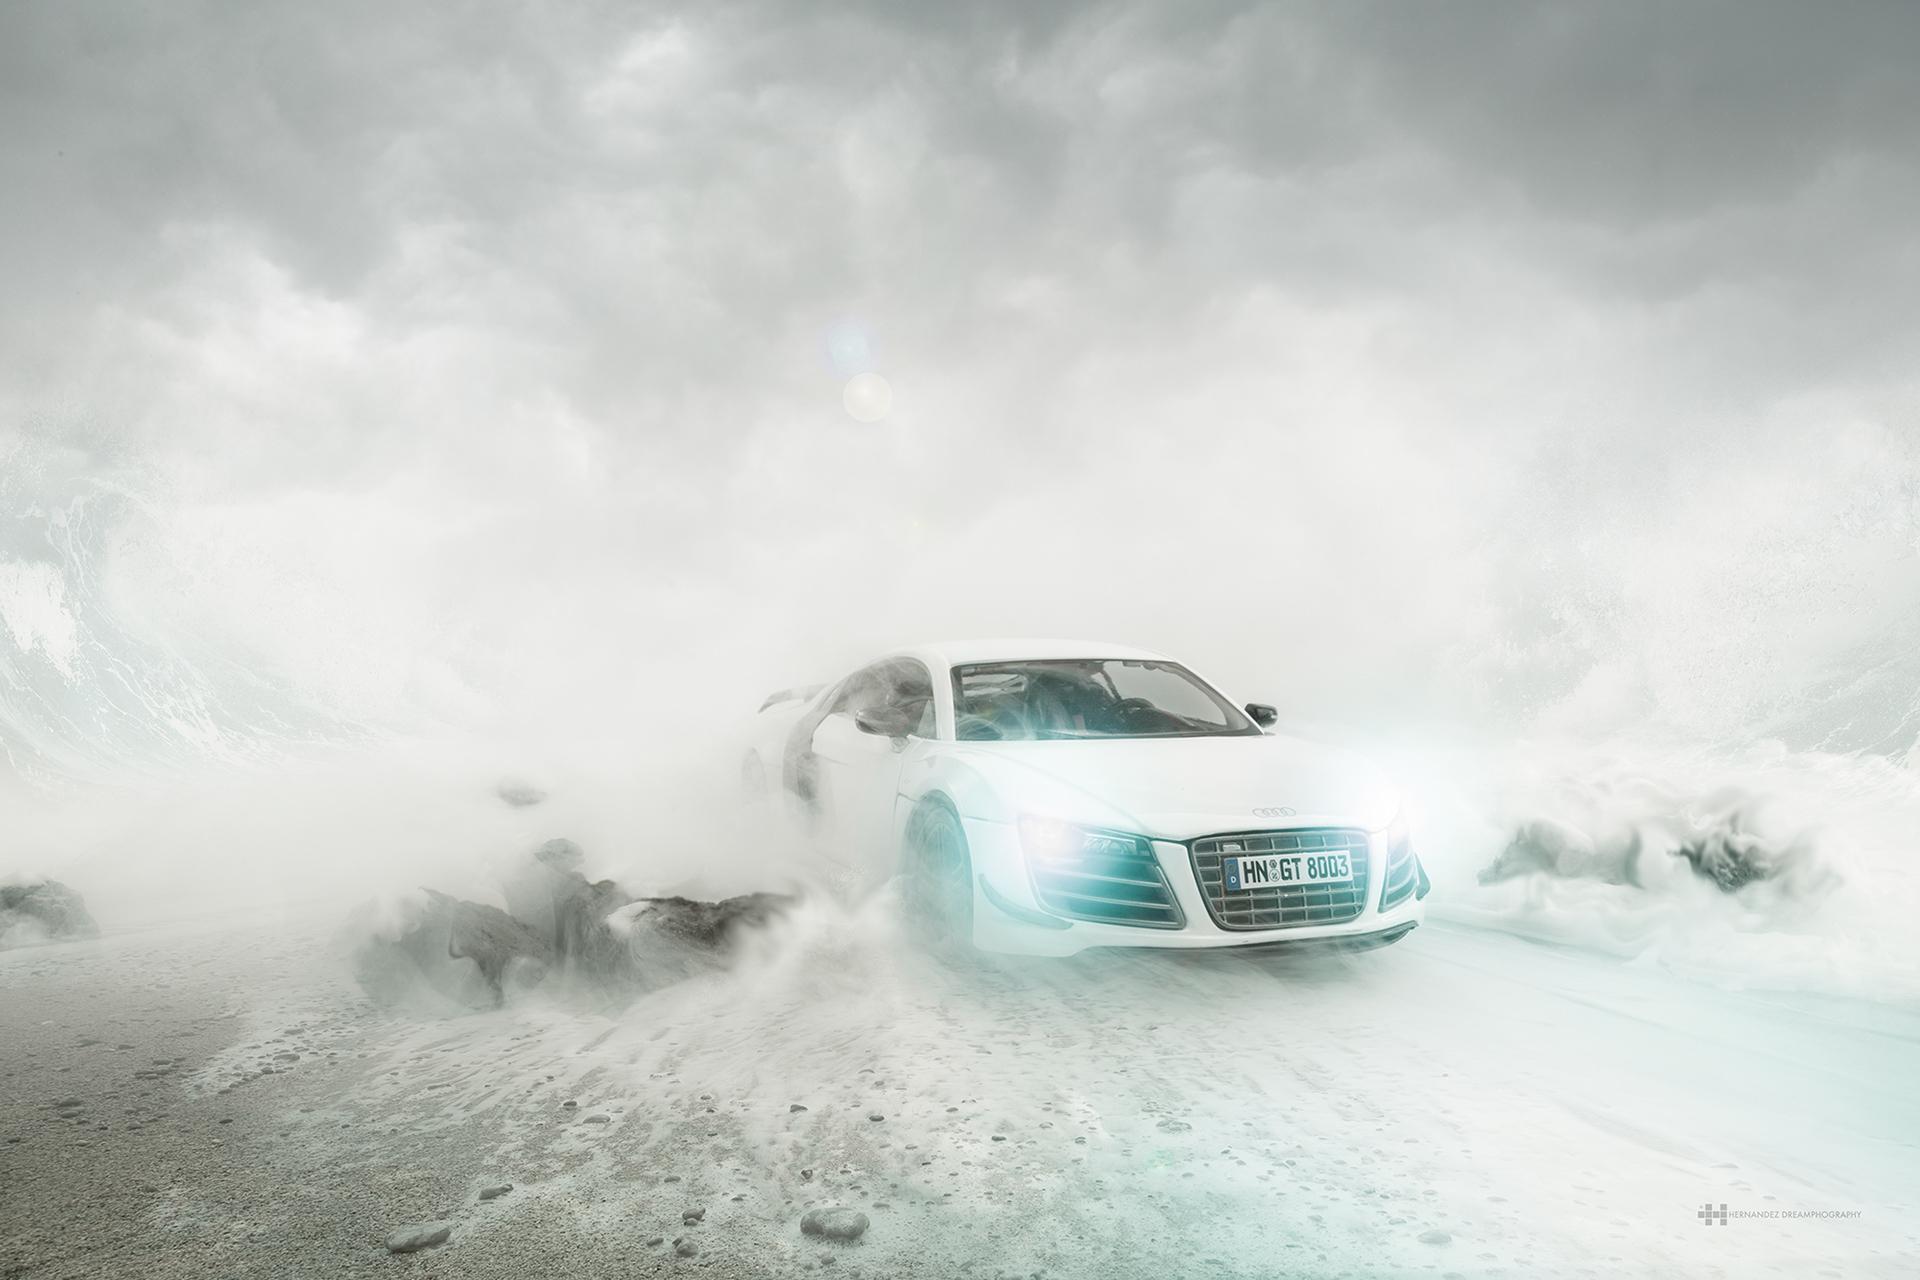 Audi R8 - Miniature Scale Model Car Photography (6)